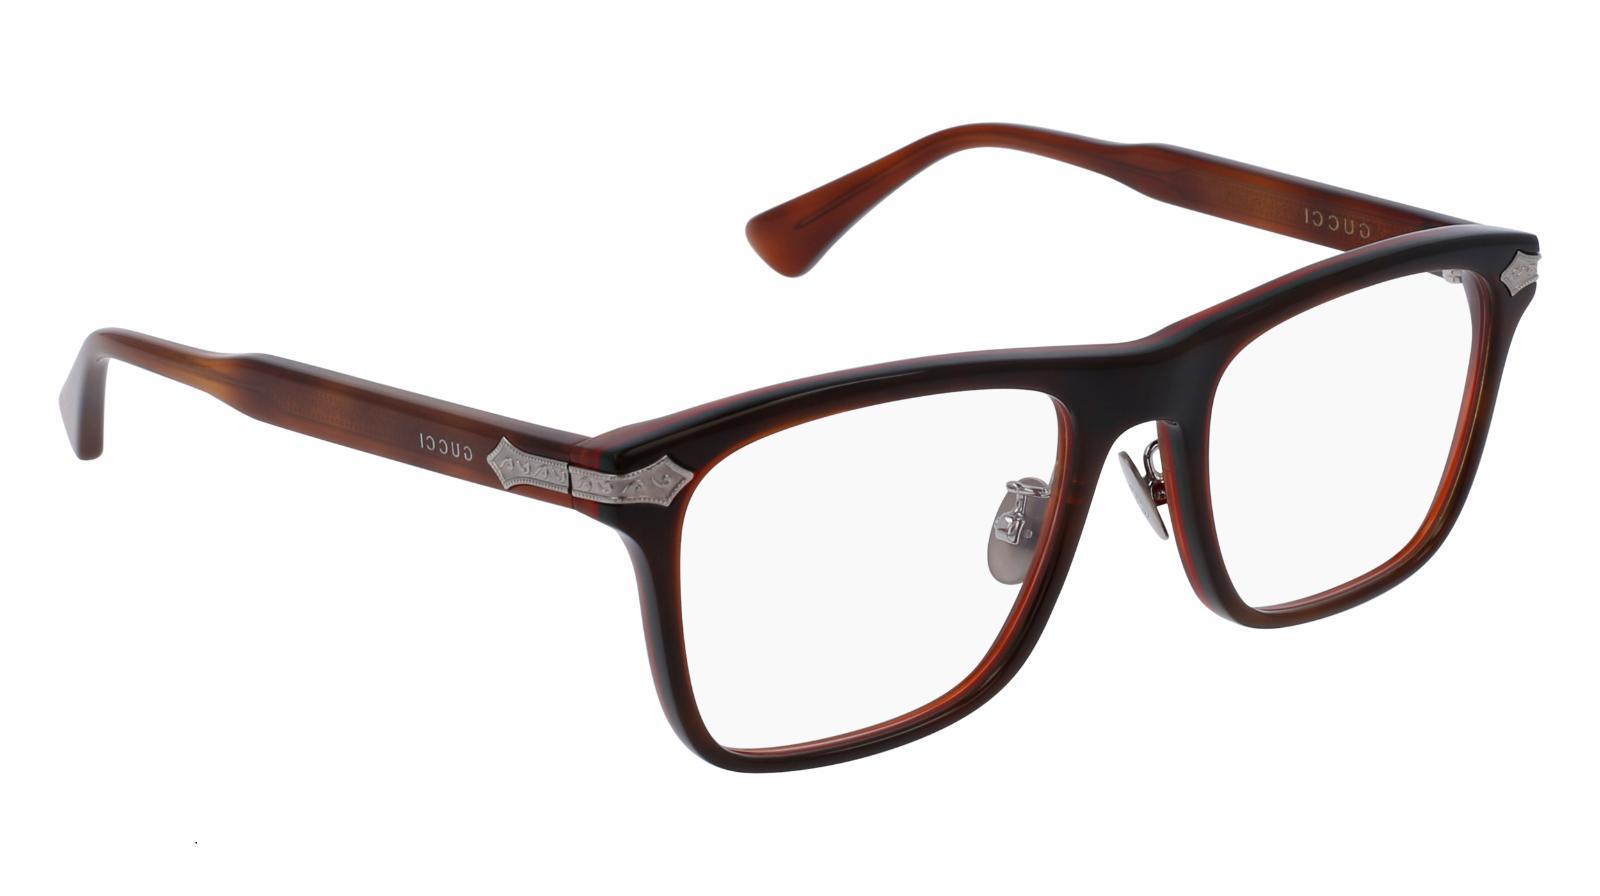 new titanium eyeglasses gg 0069o 003 size